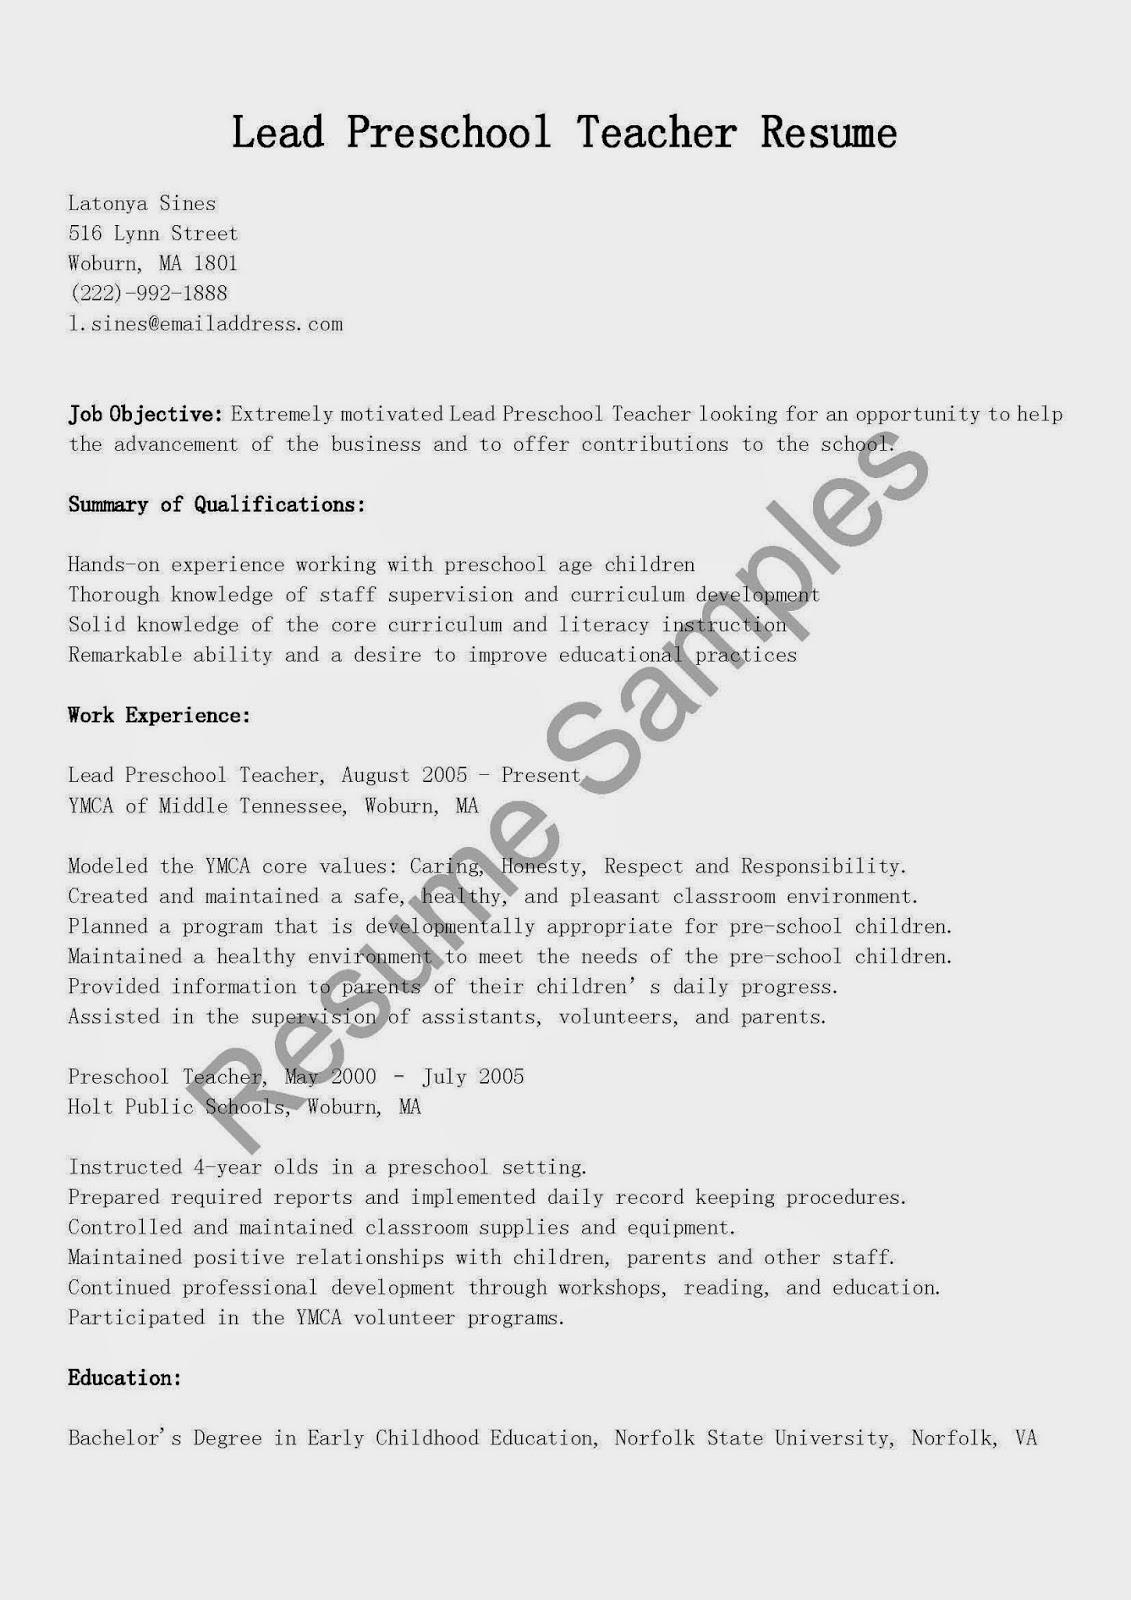 Resume Samples Lead Preschool Teacher Resume Sample